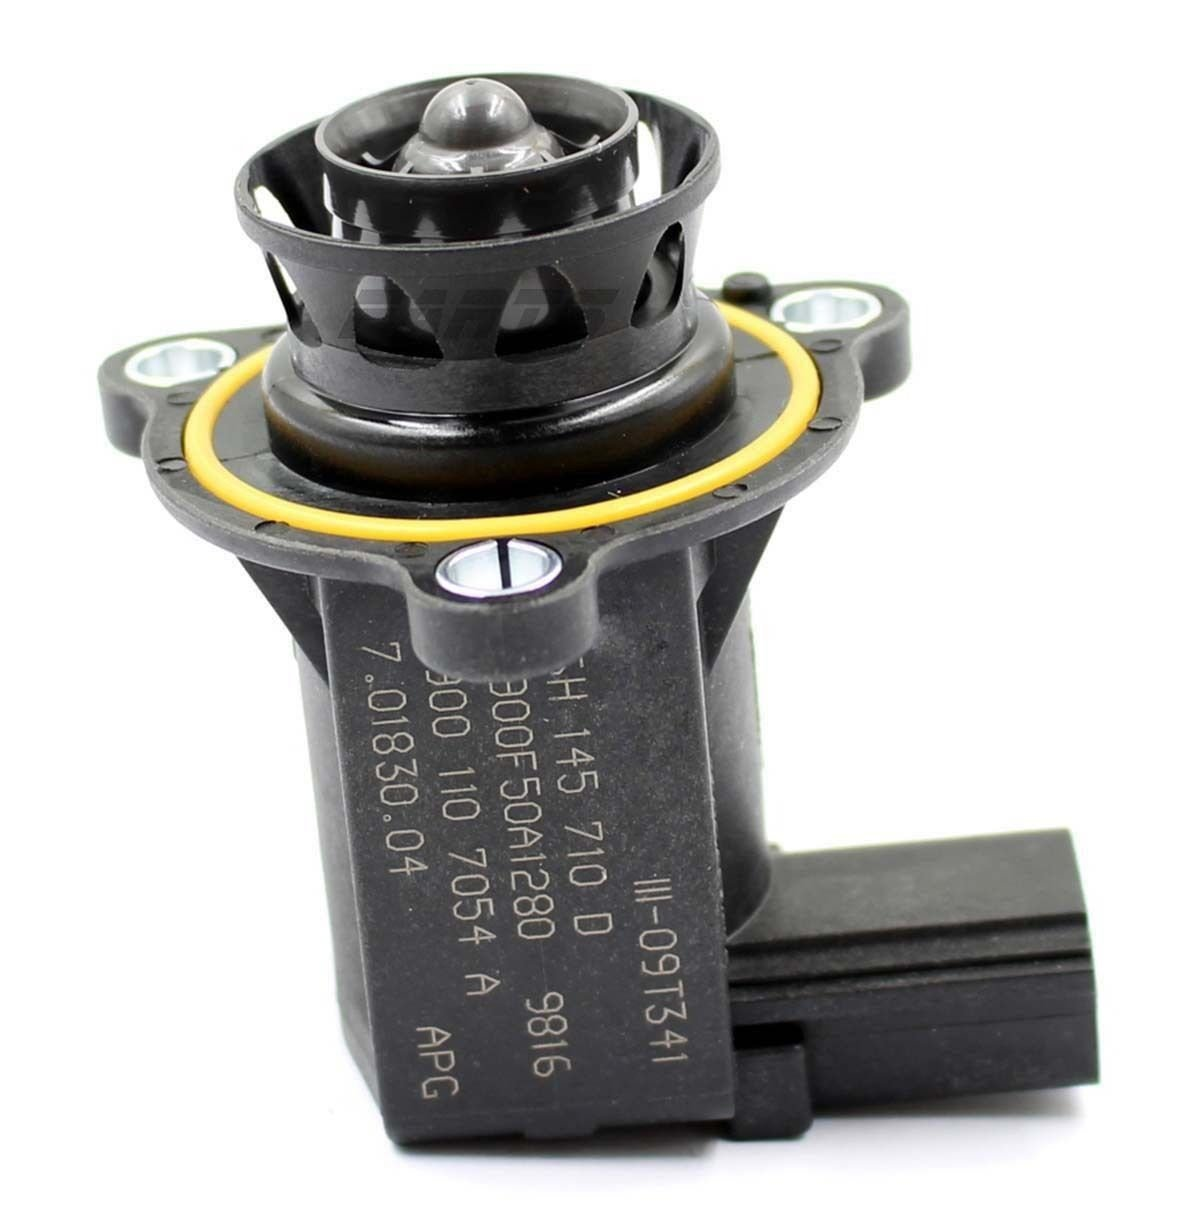 Amazon.com: New Turbo Turbocharger Cut Off Bypass Valve 06H145710D For Audi A4 VW Passat: Car Electronics